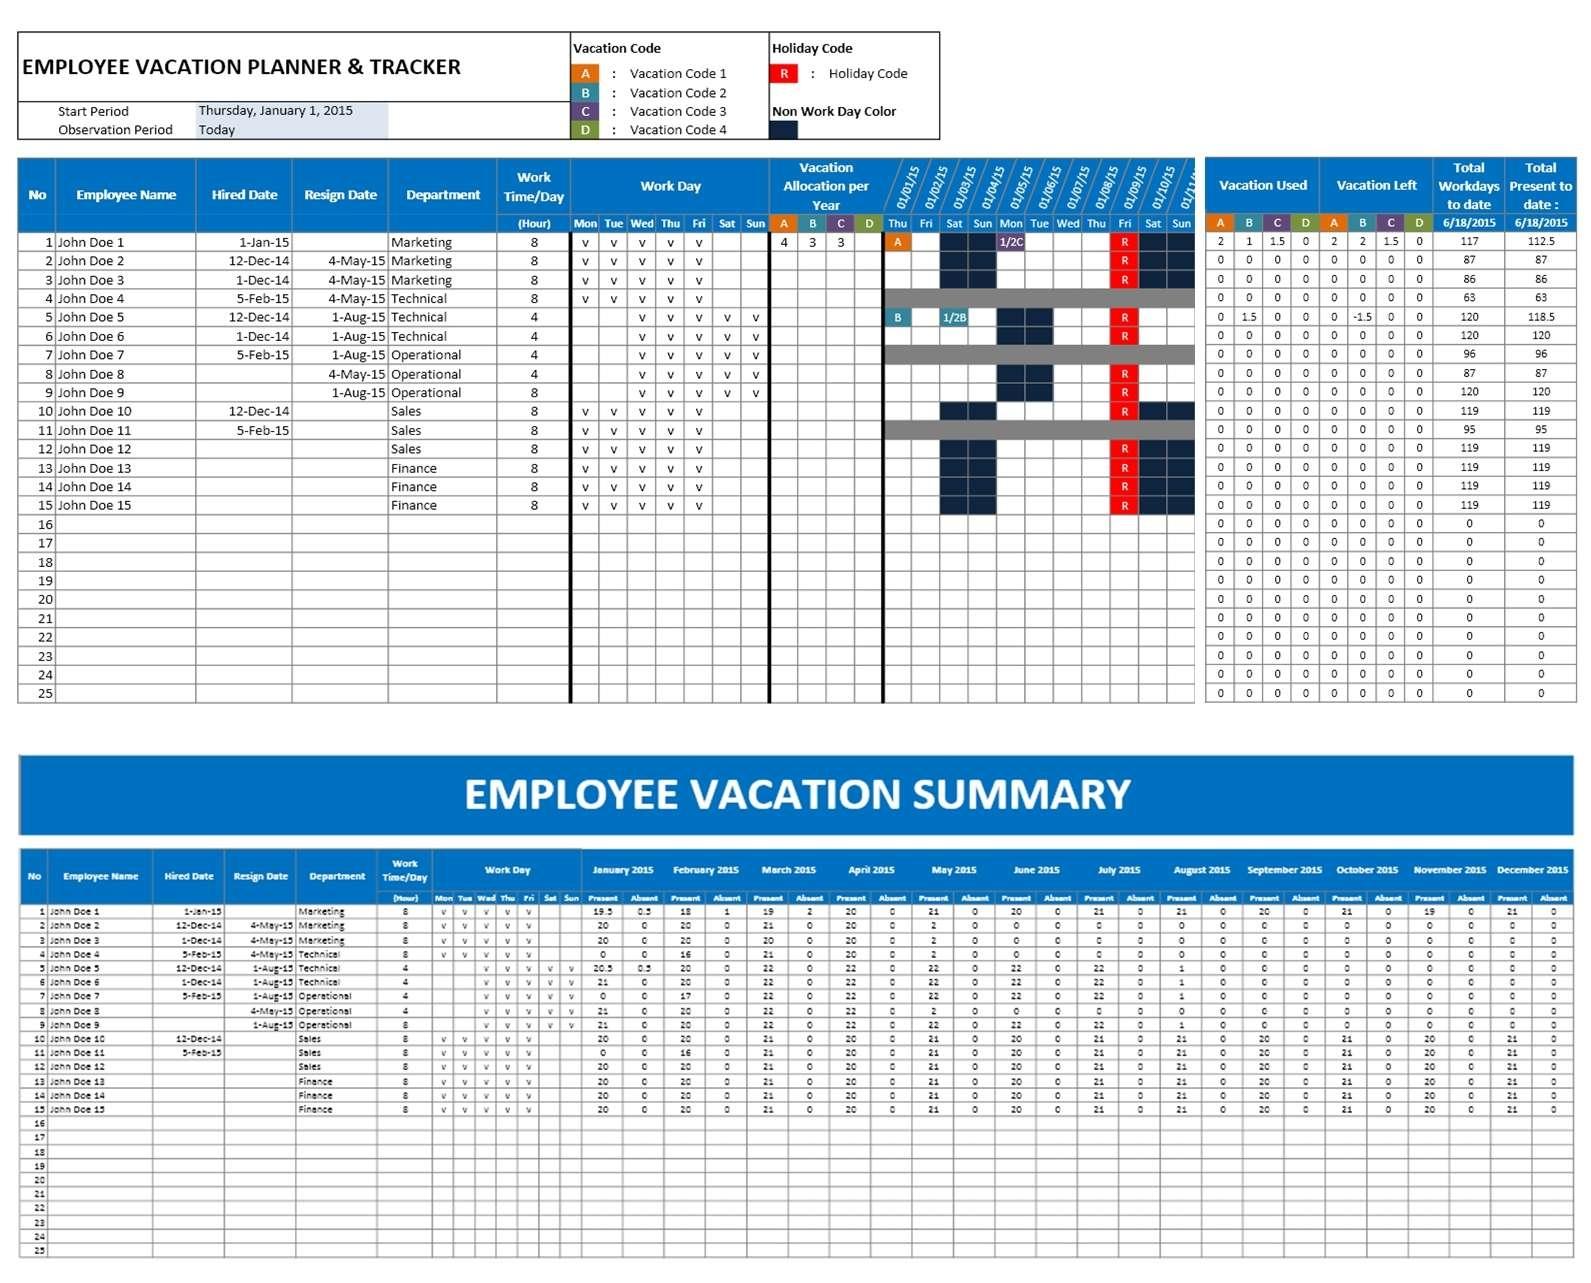 Vacation Planner 89uj